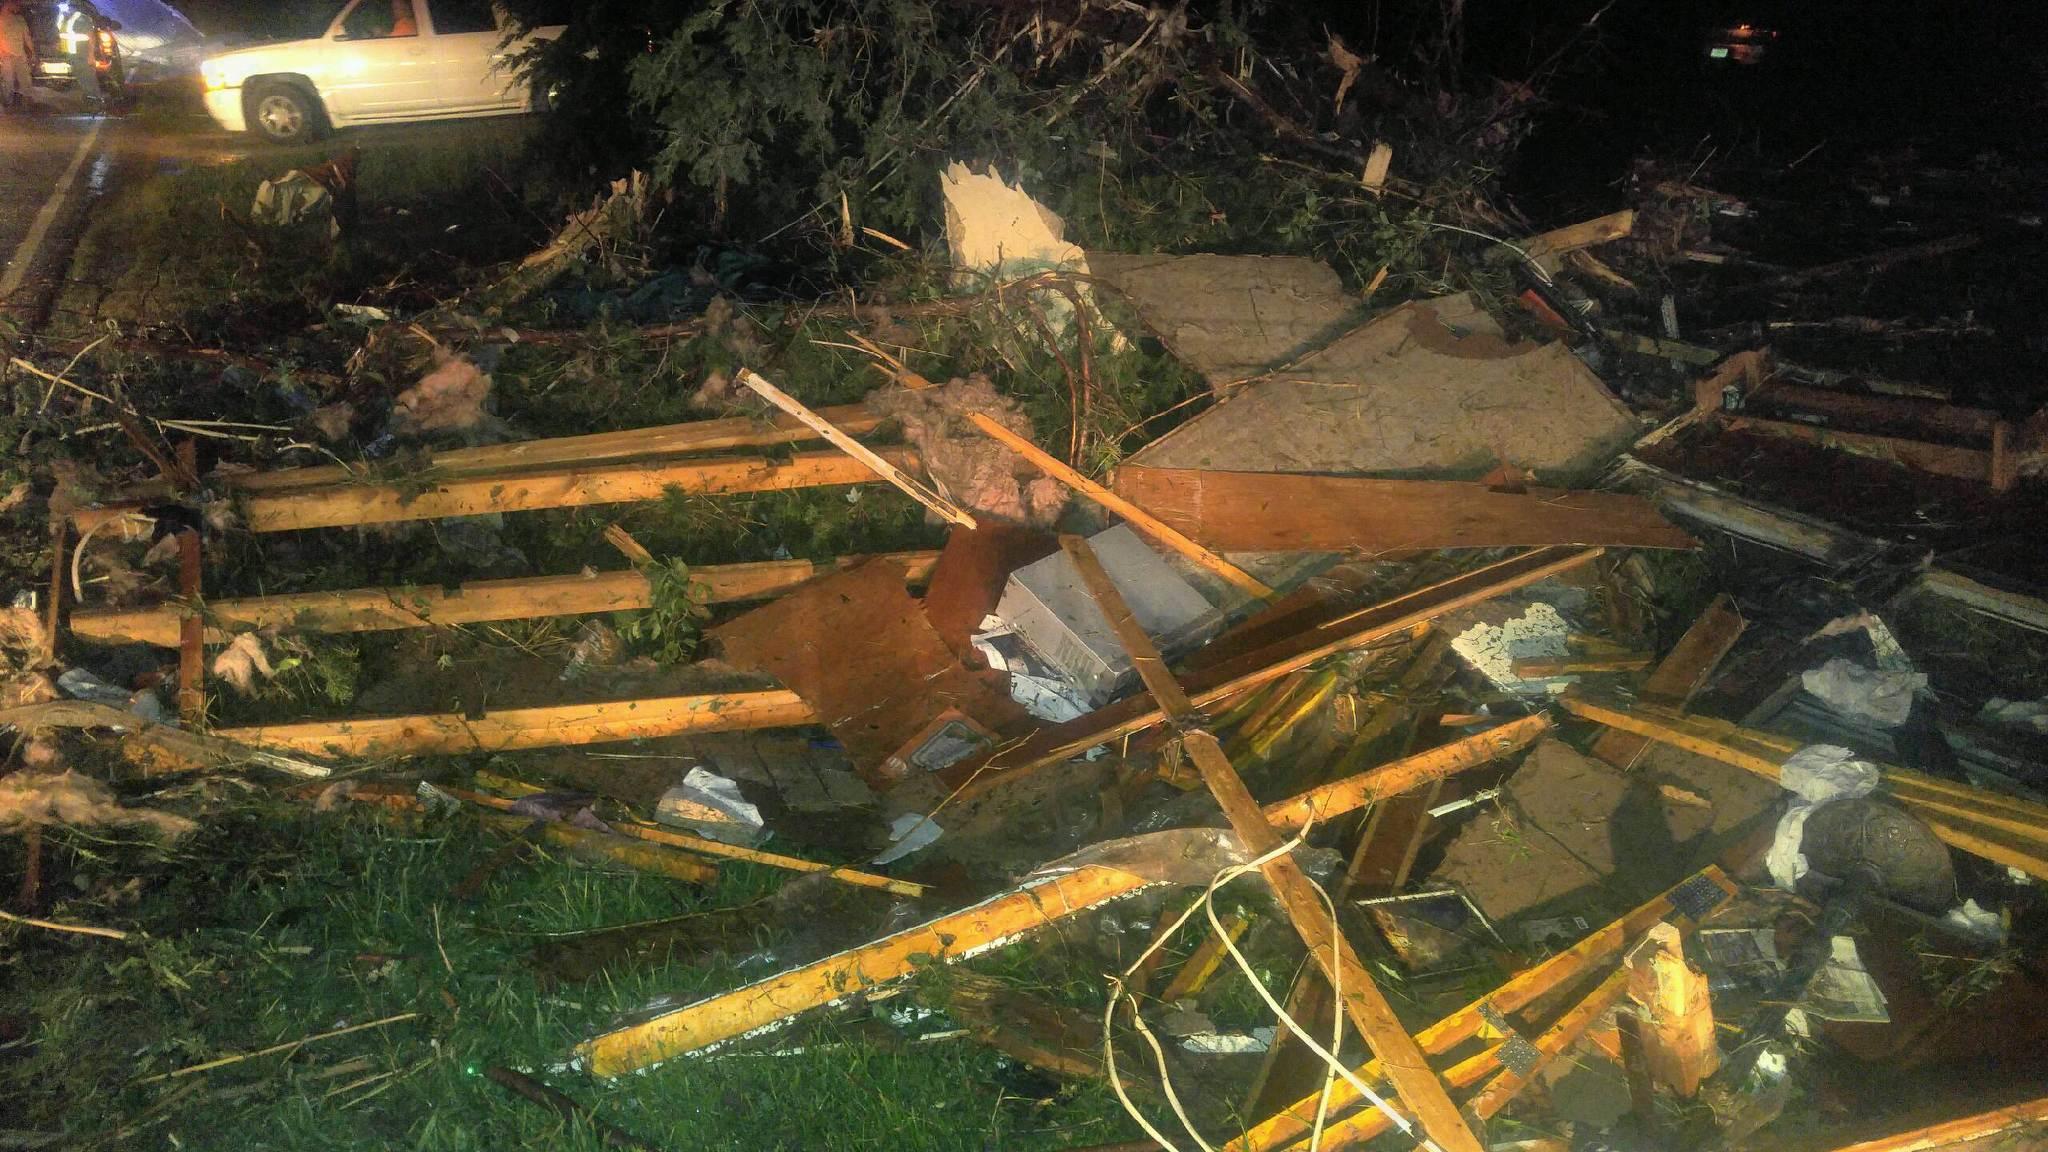 Three dead so far from possible tornado